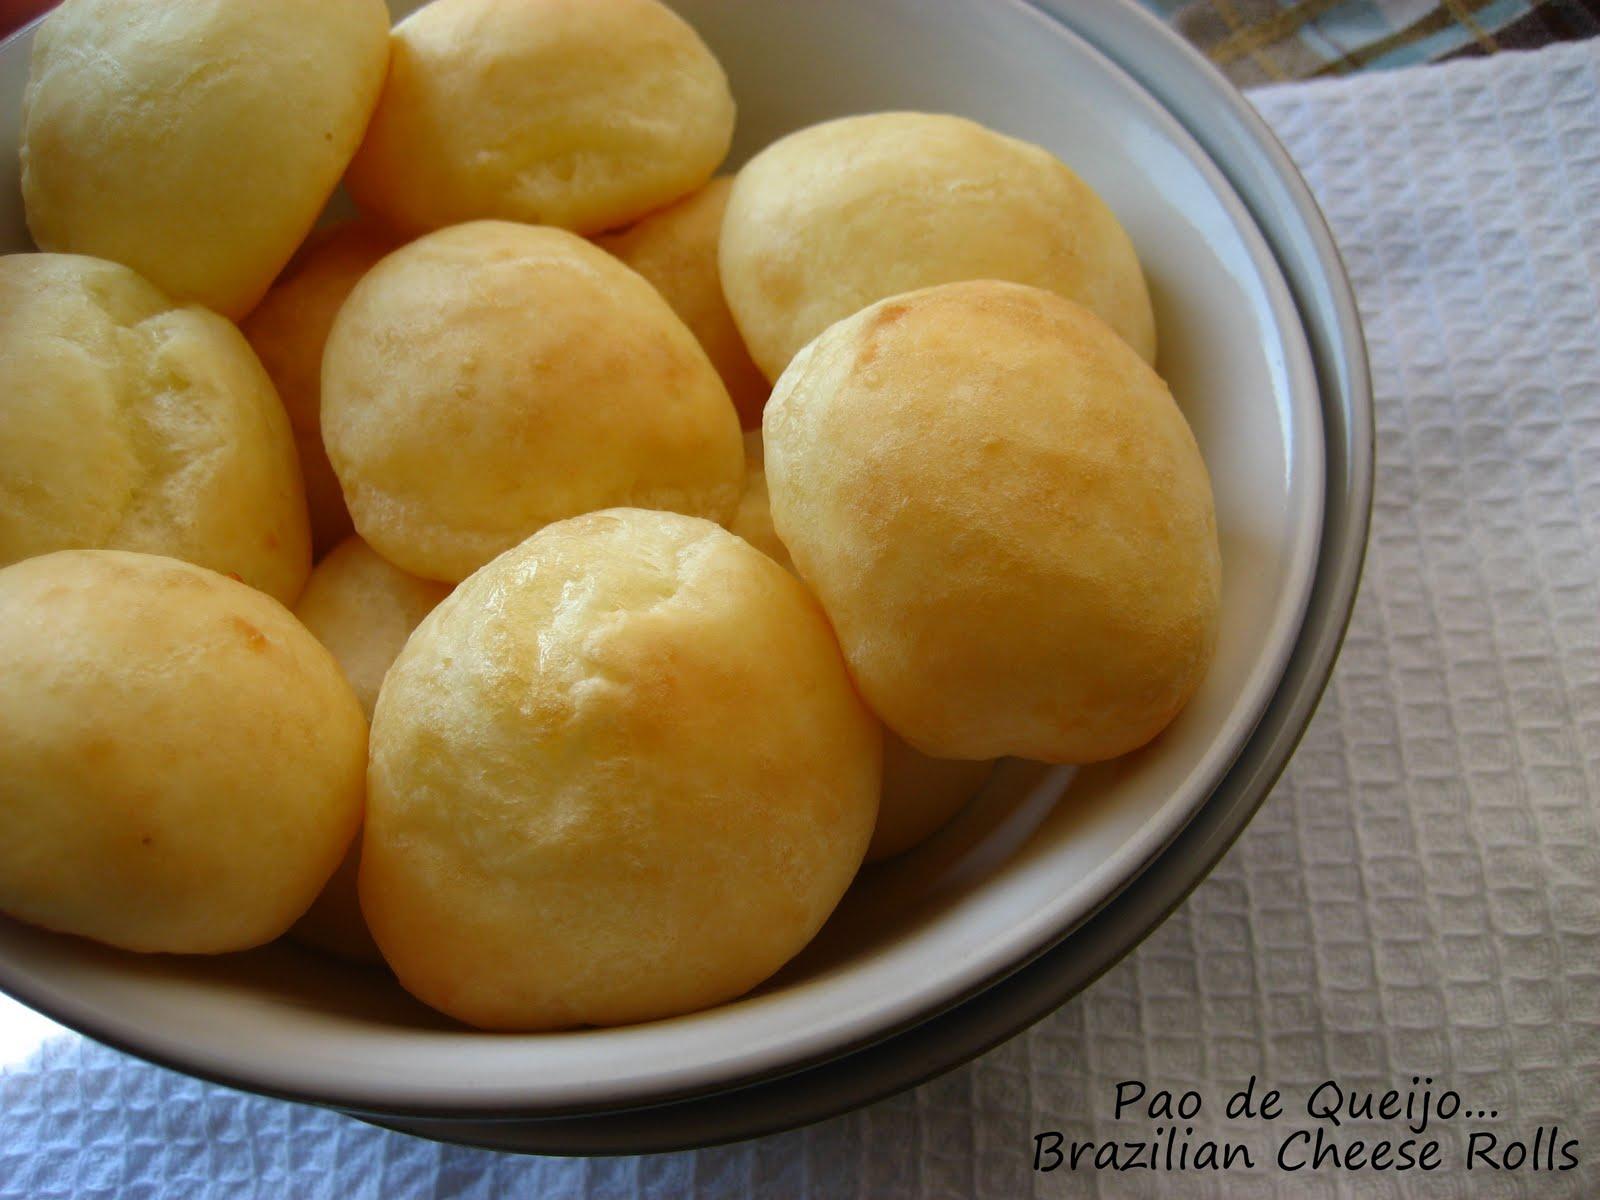 ... Montana: Brazilian Pao de Queijo....or Cheese Bread Rolls(Gluten-Free